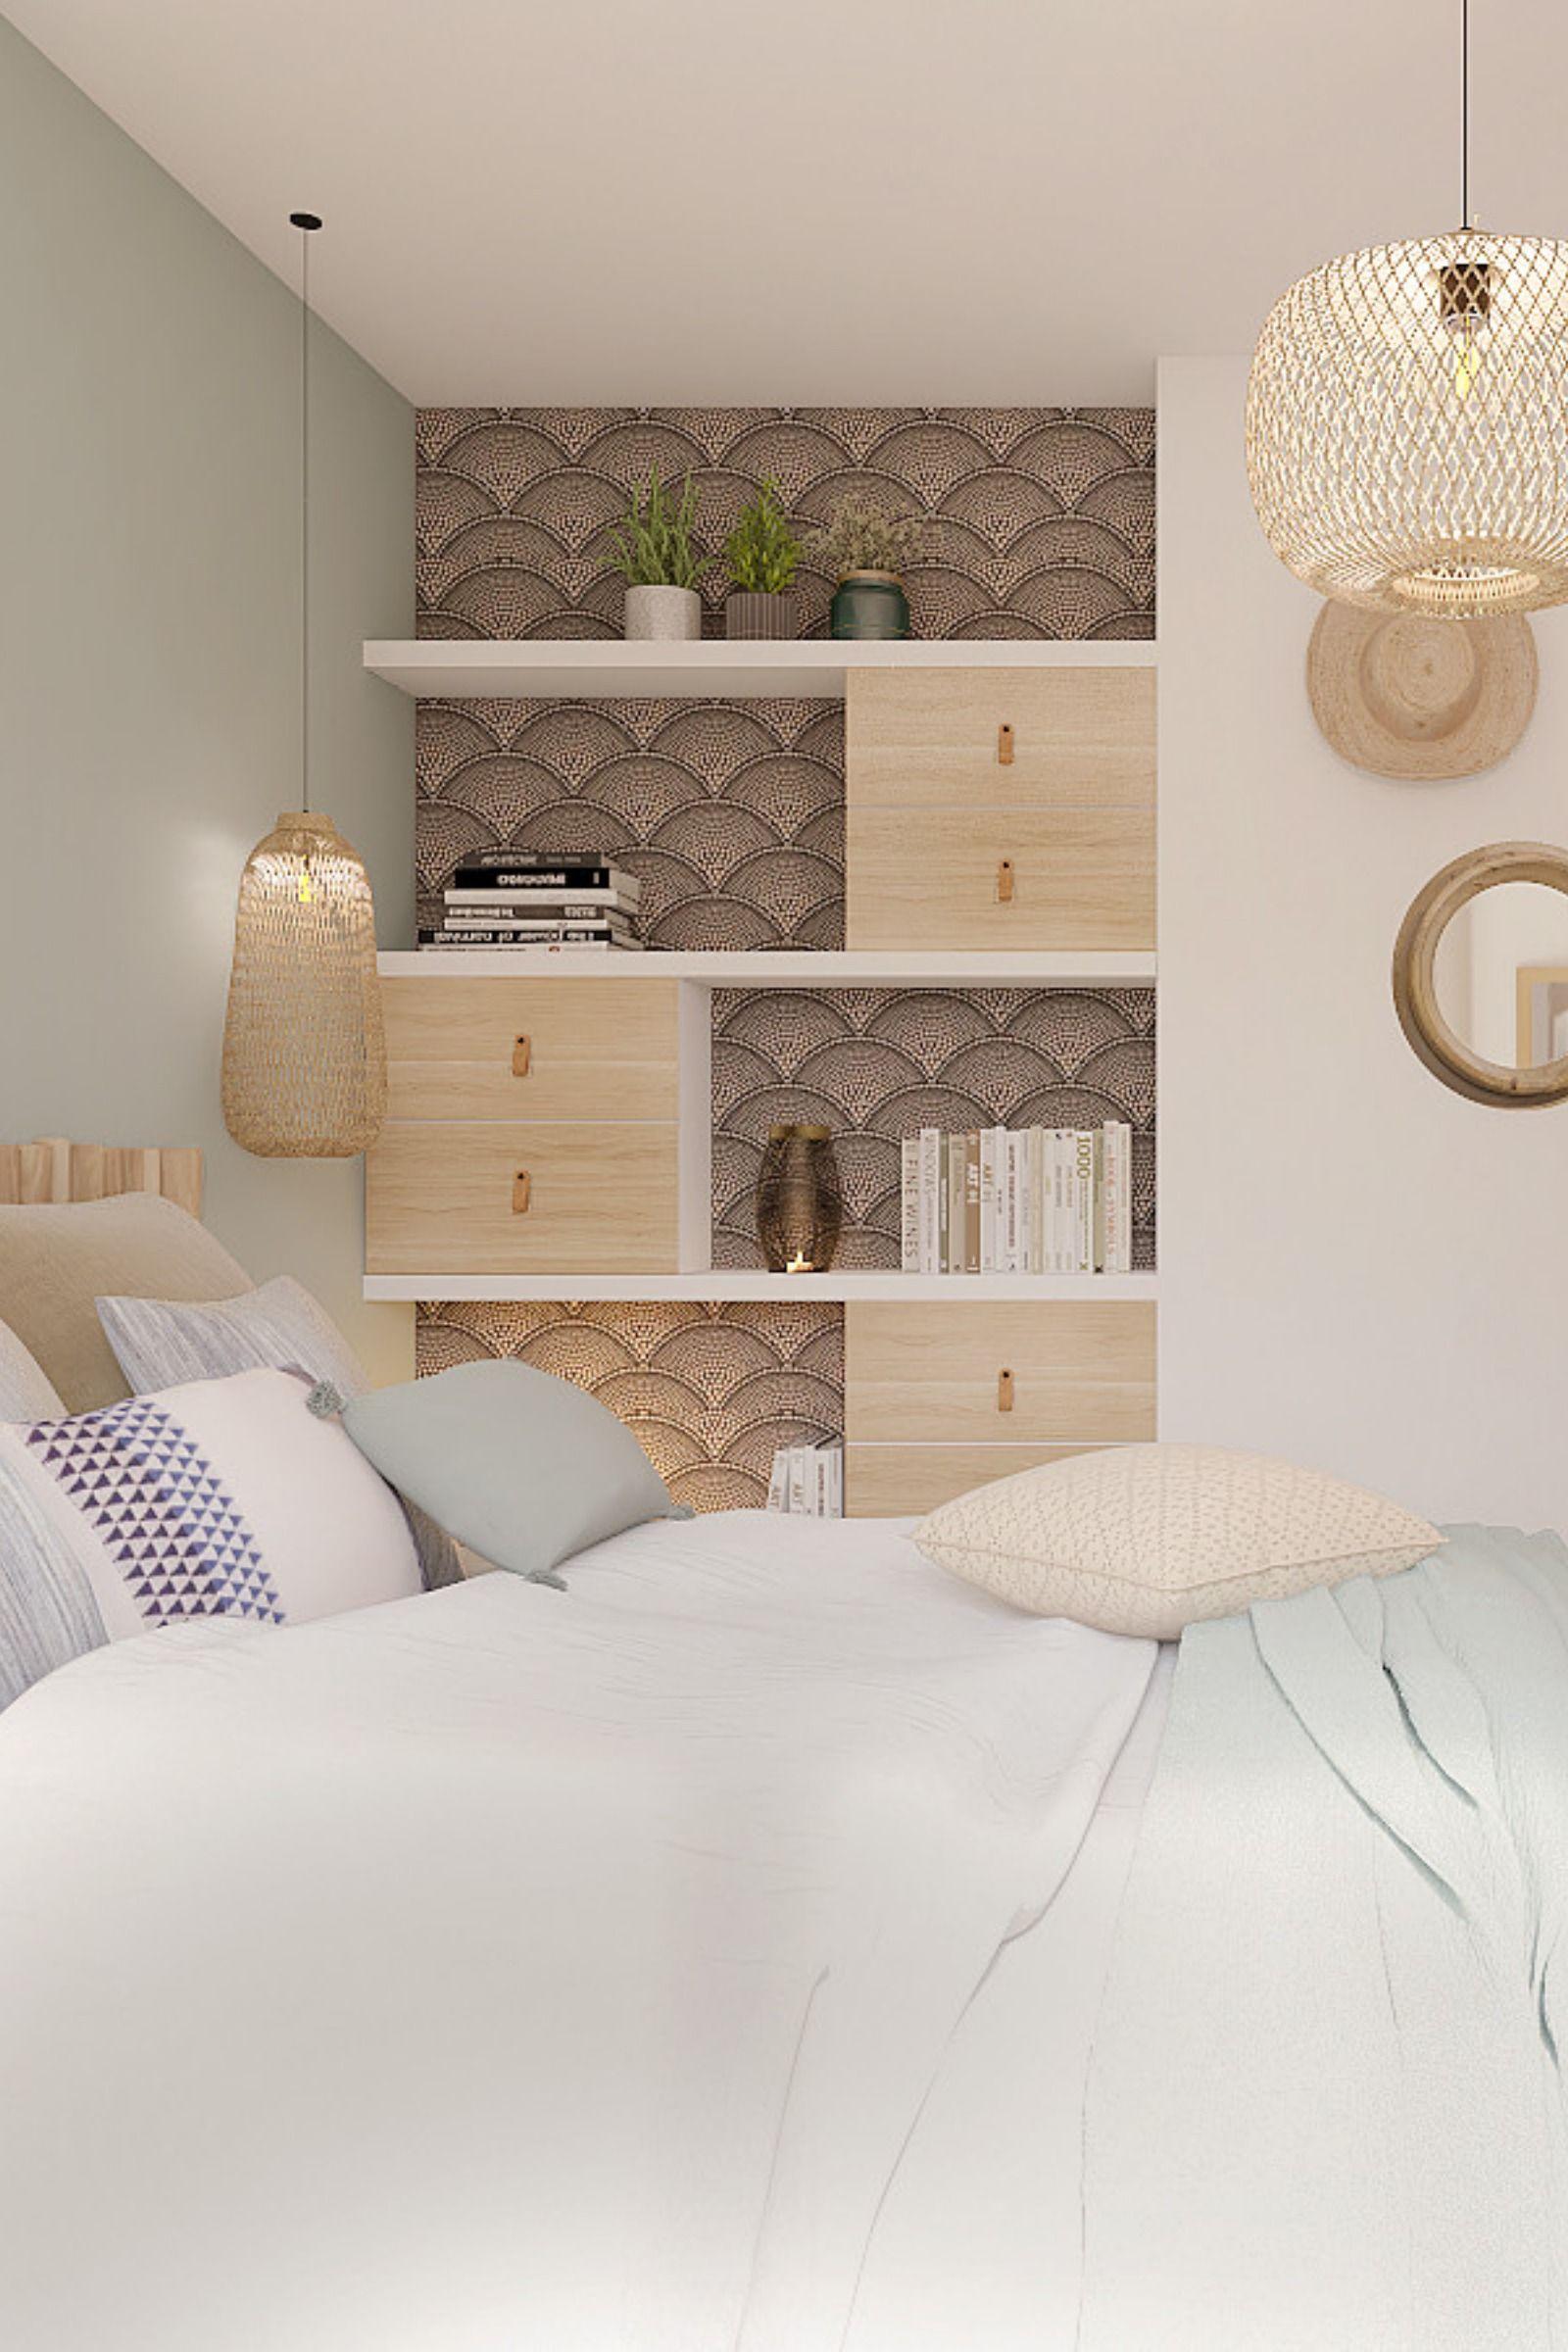 Chambre Style Bord De Mer Deco Chambre Parents Chambre A Coucher Avec Dressing Deco Chambre A Coucher